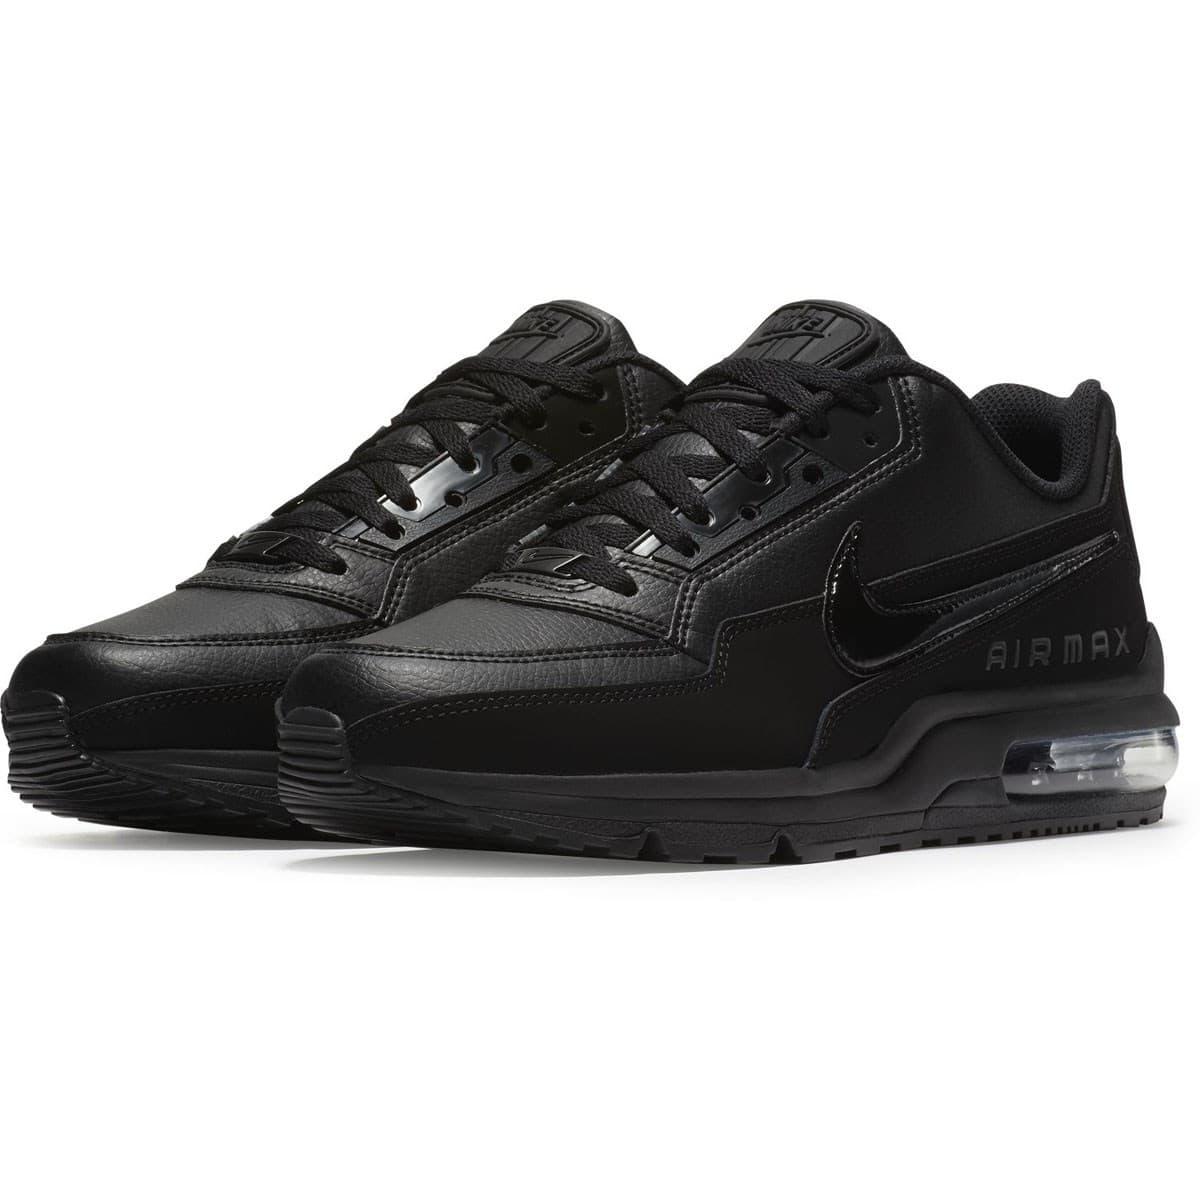 Air Max Ltd 3 Erkek Siyah Spor Ayakkabı